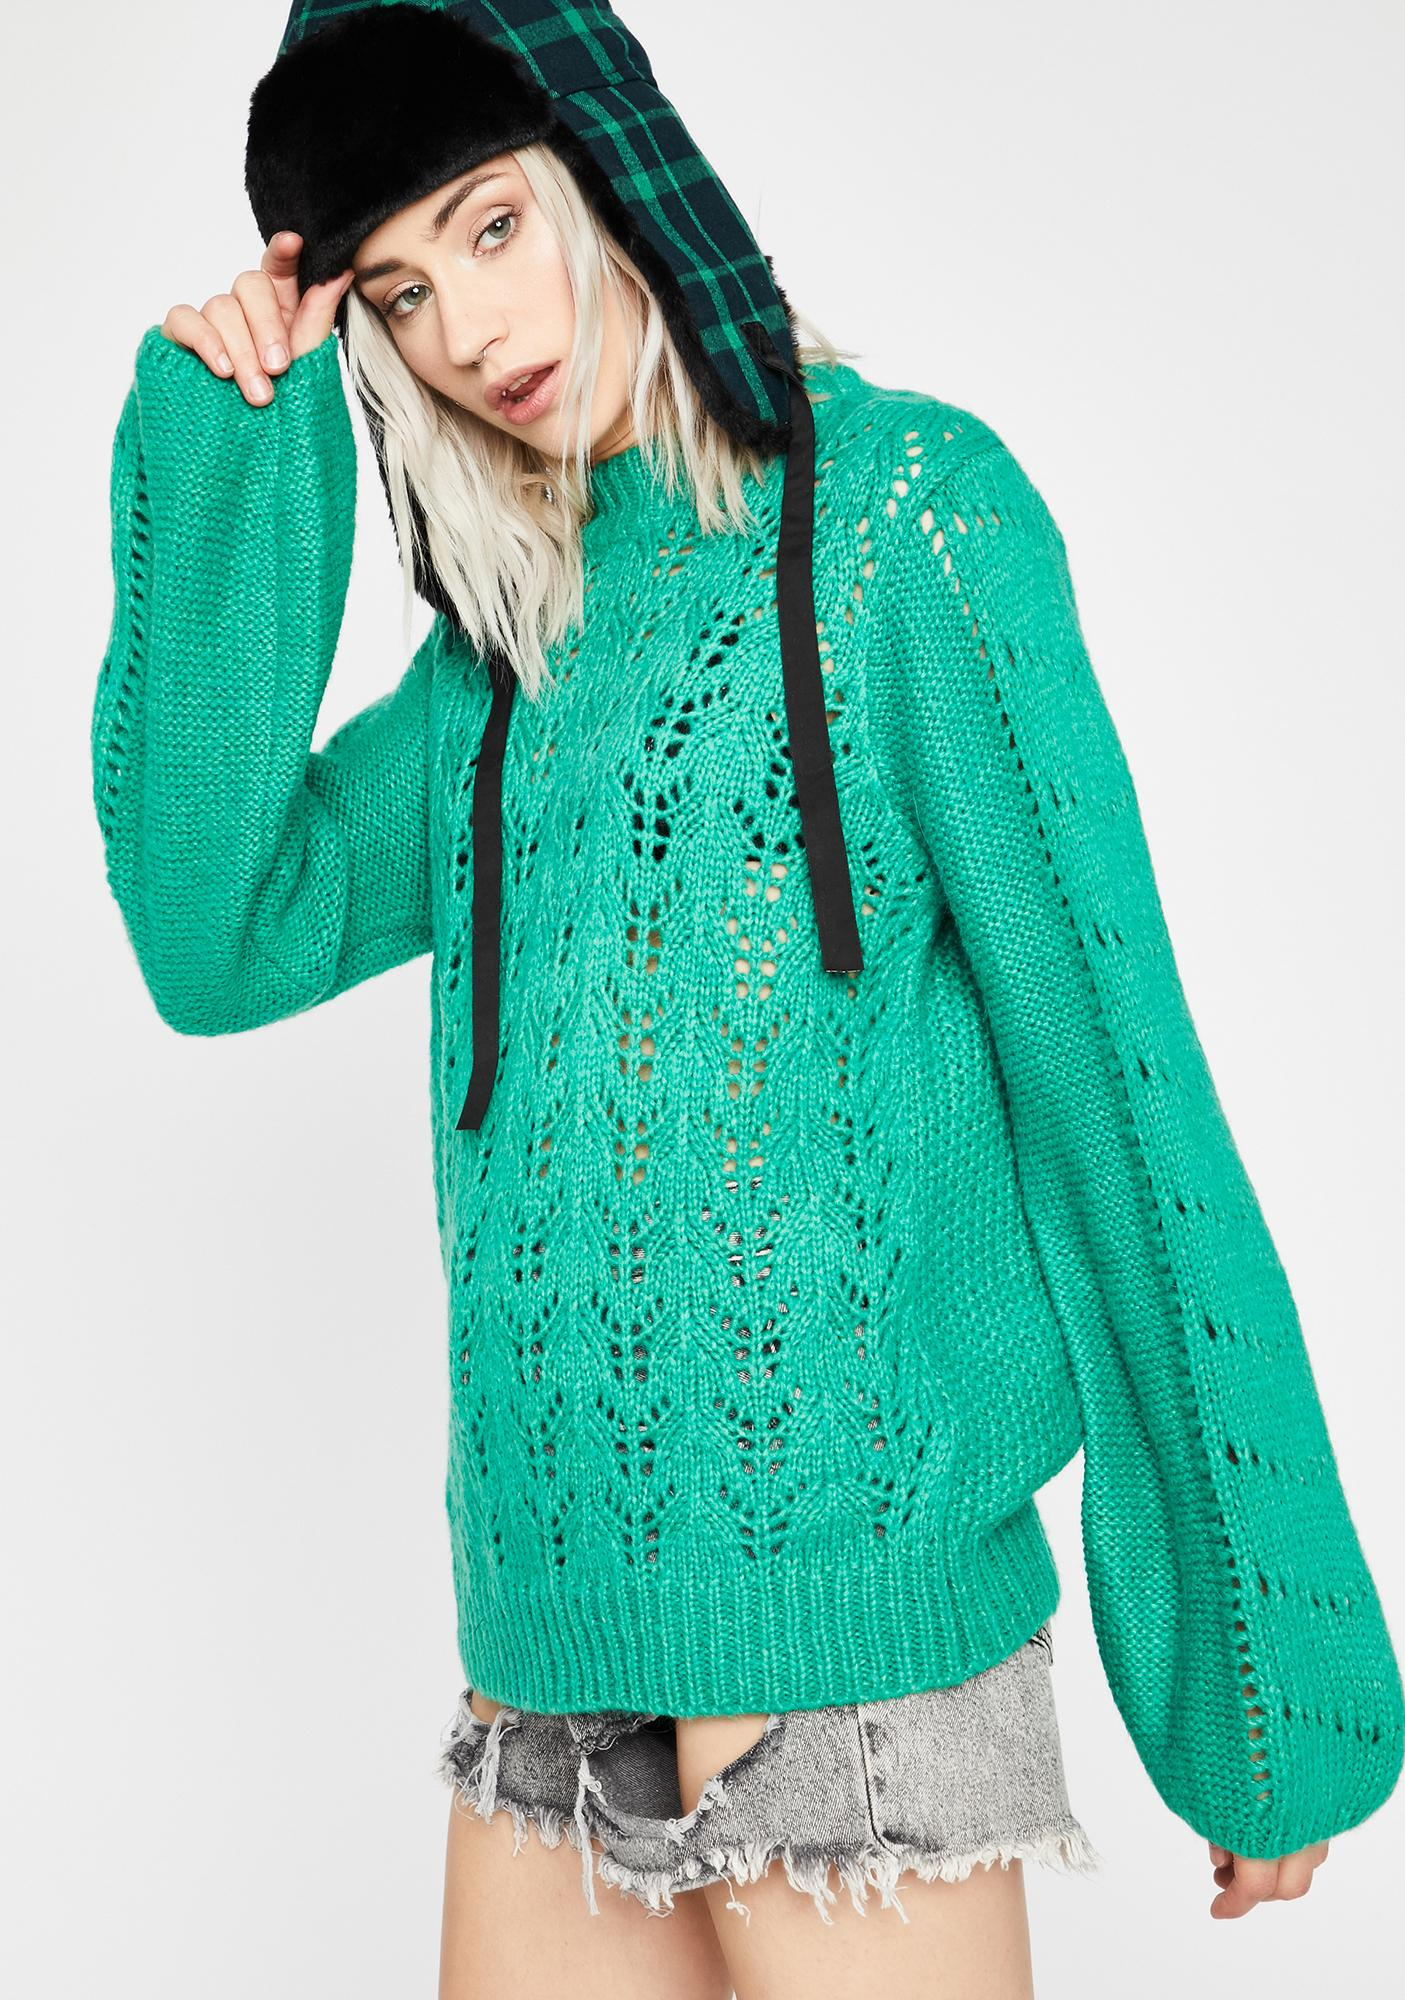 BURRR Knit Sweater